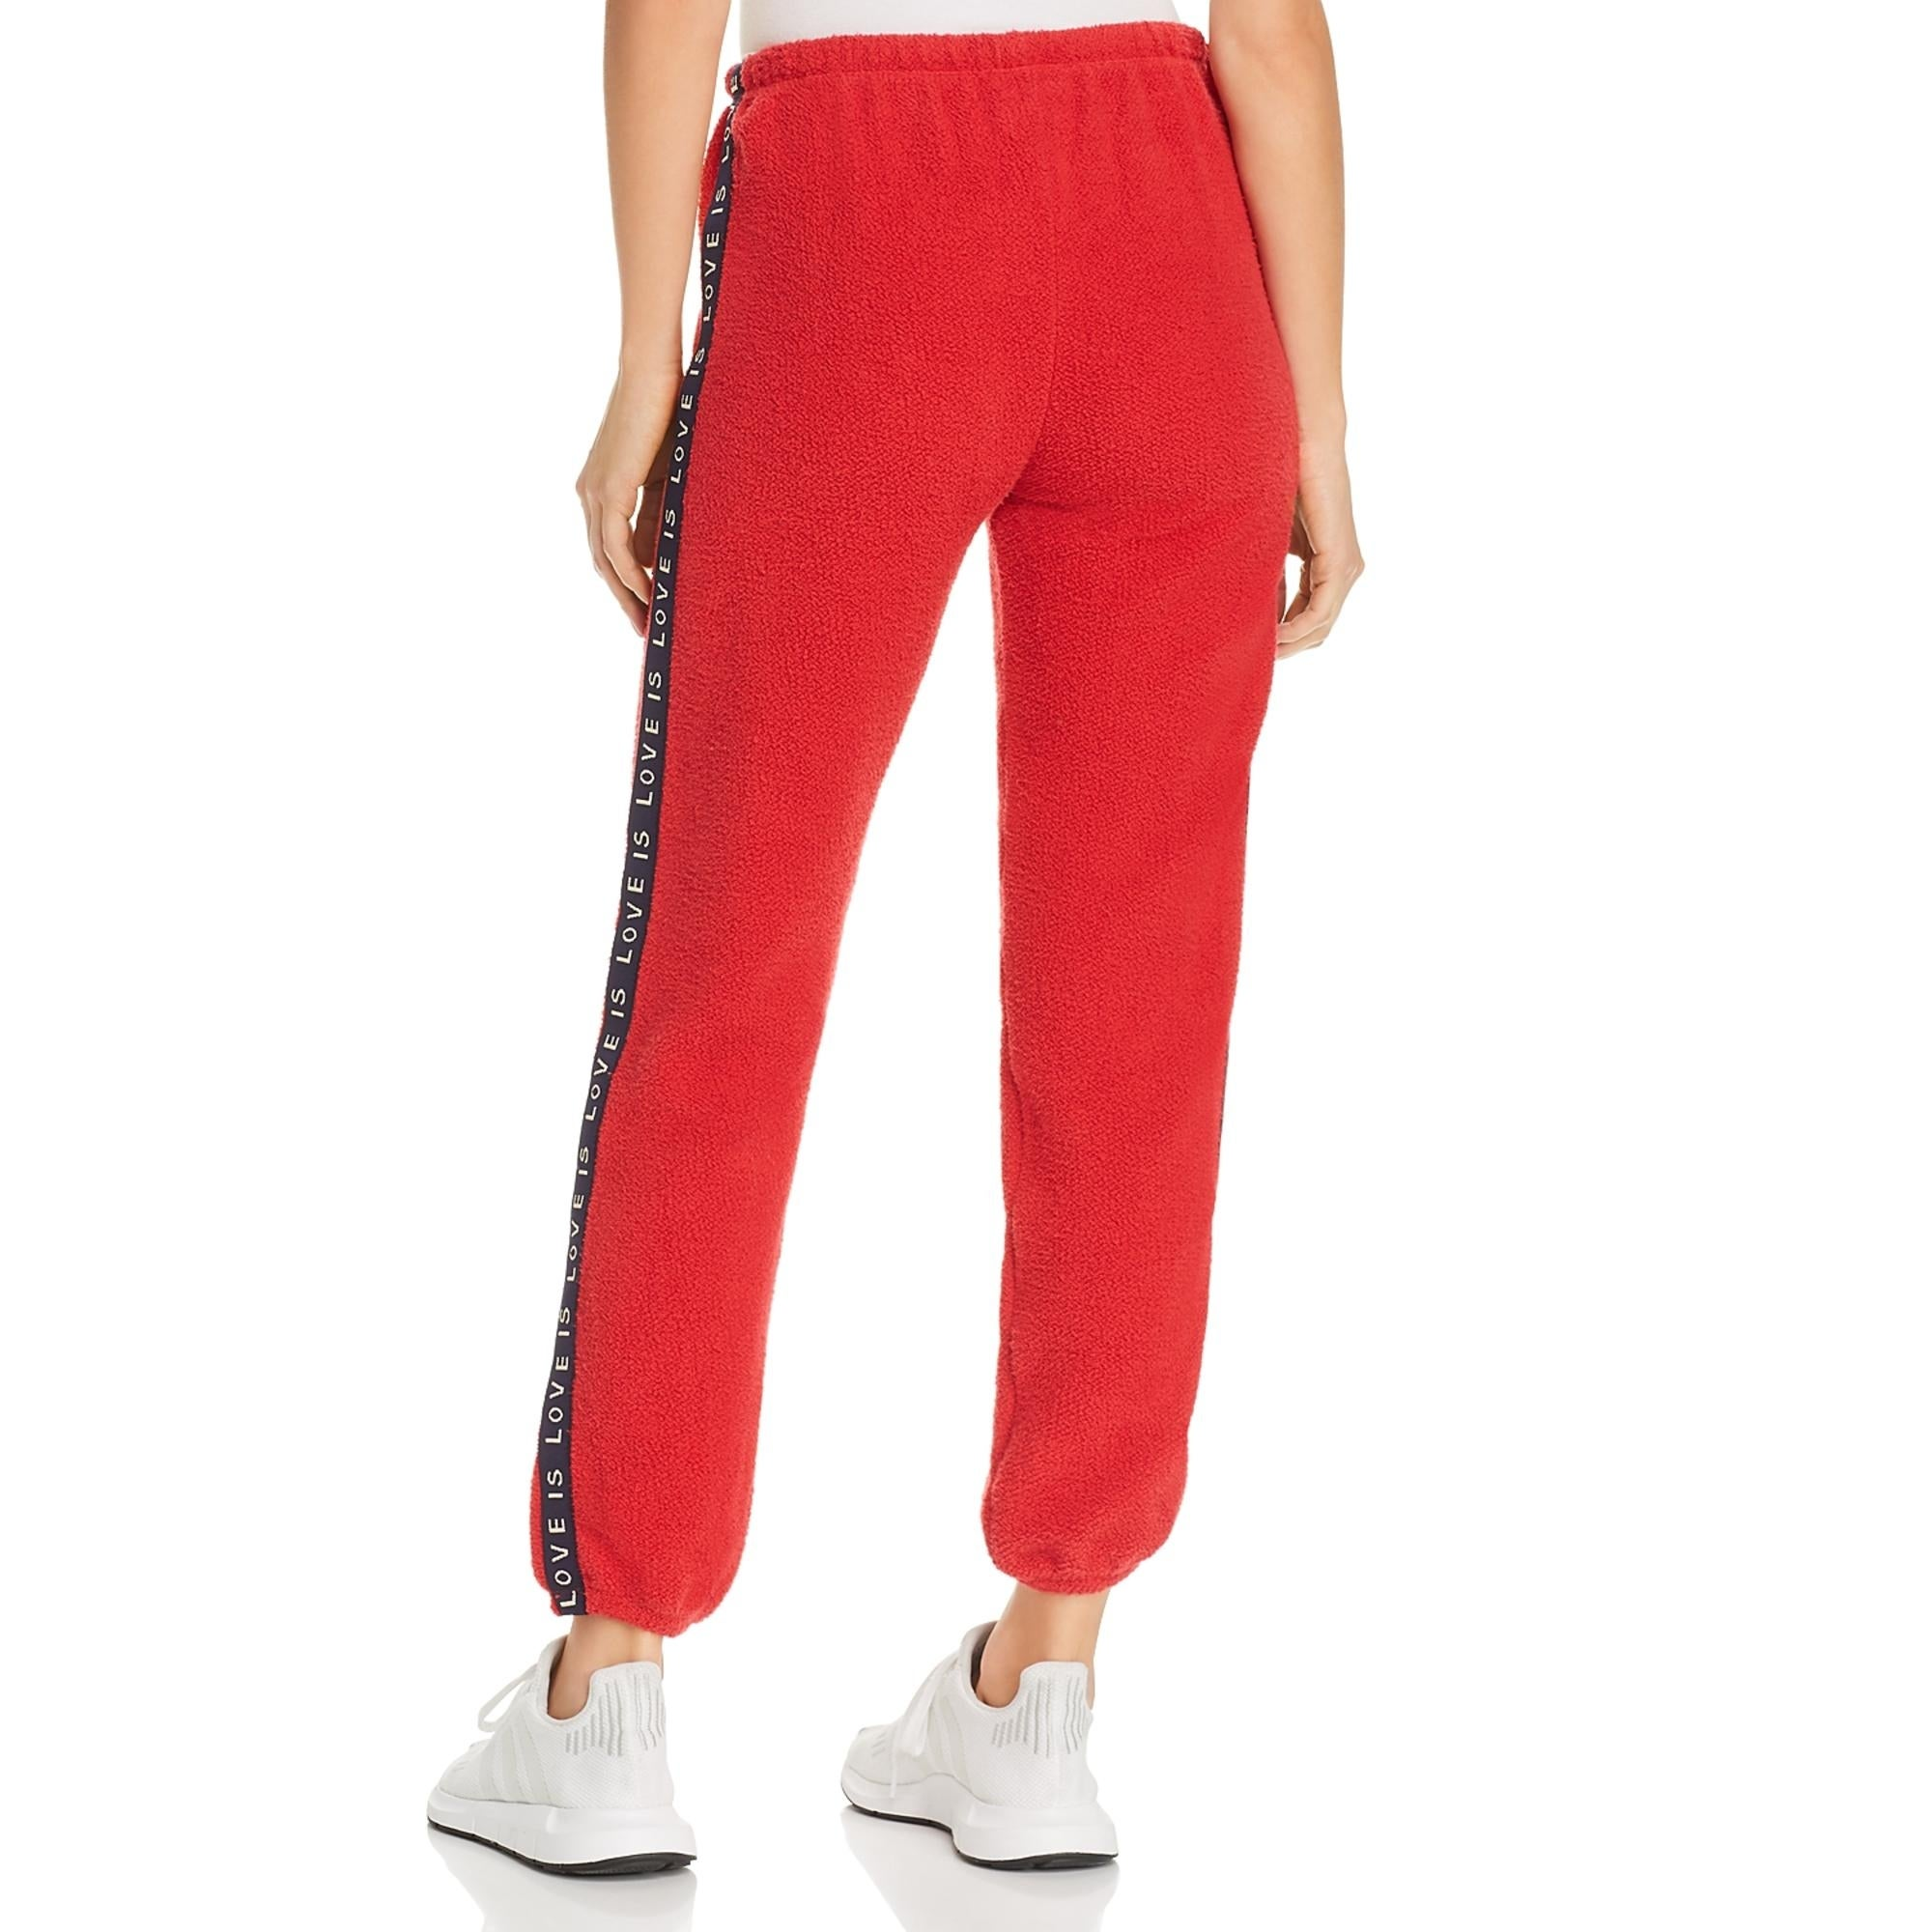 SUNDRY Womens Cozy Stripes Sweatpants